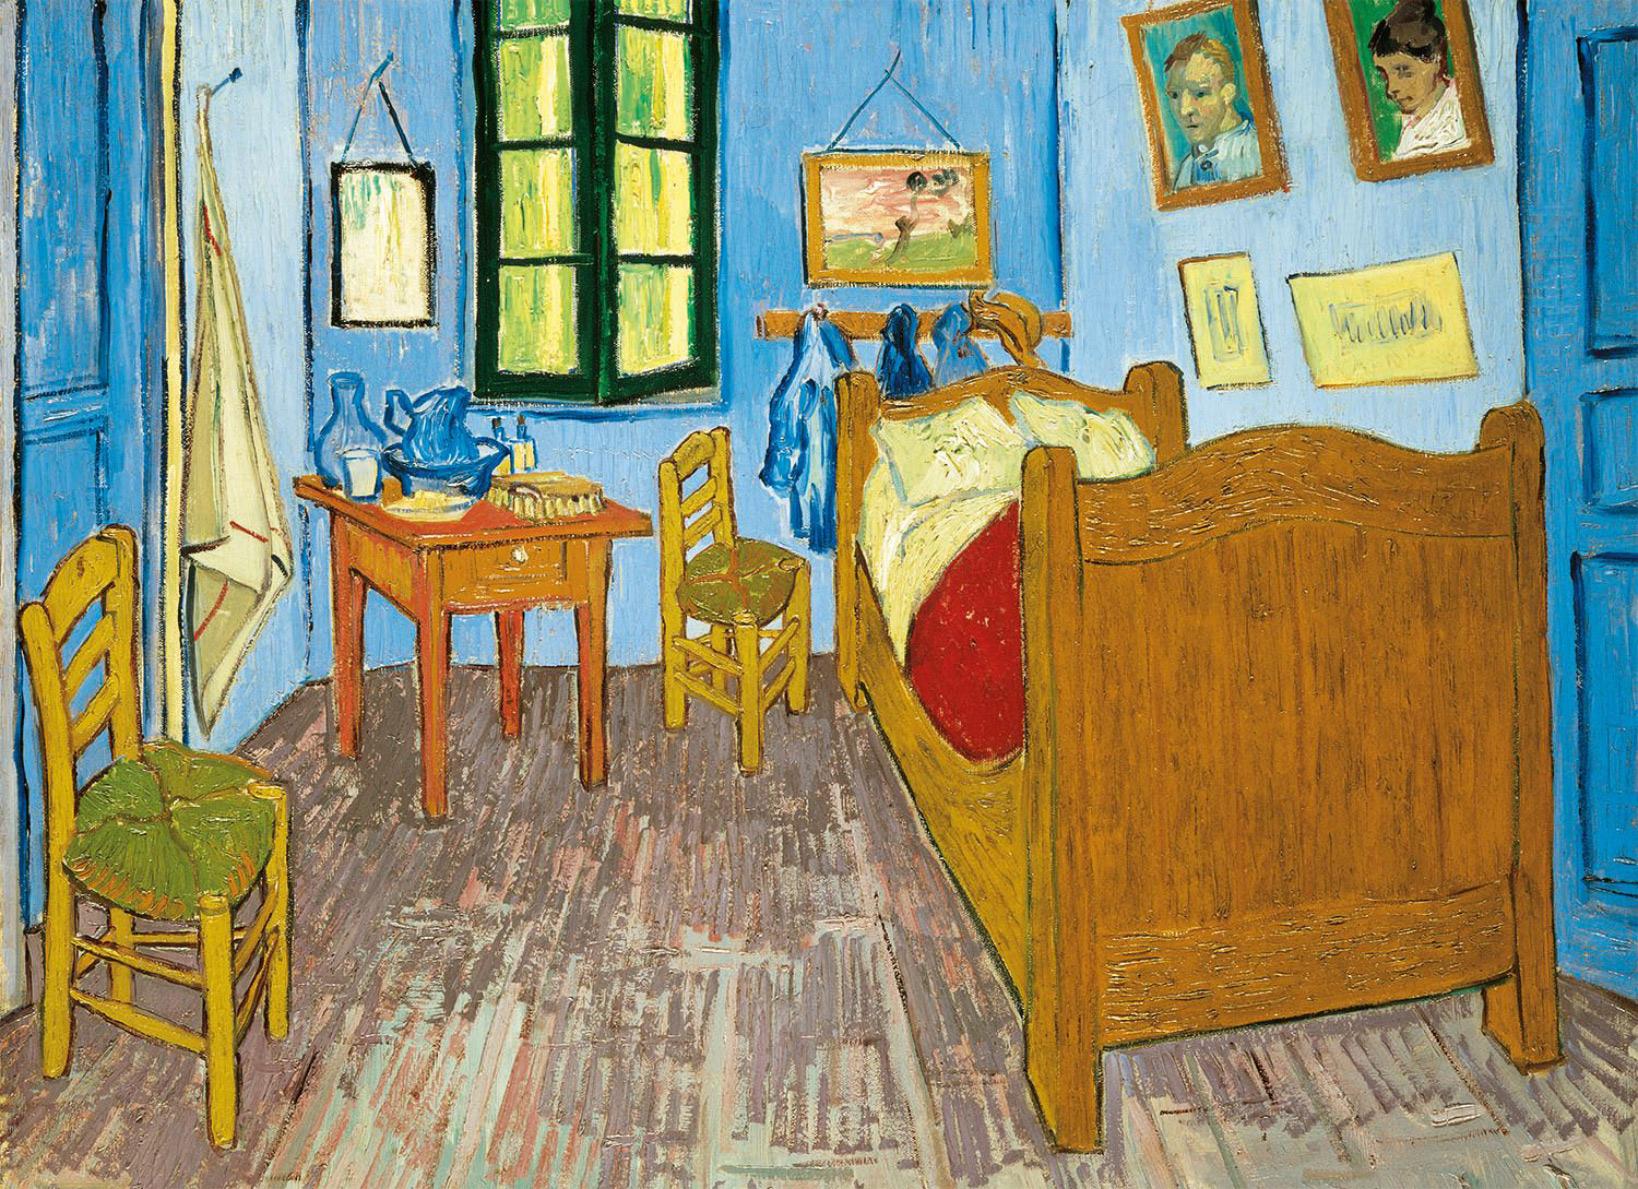 Bedroom in Arles Fine Art Jigsaw Puzzle